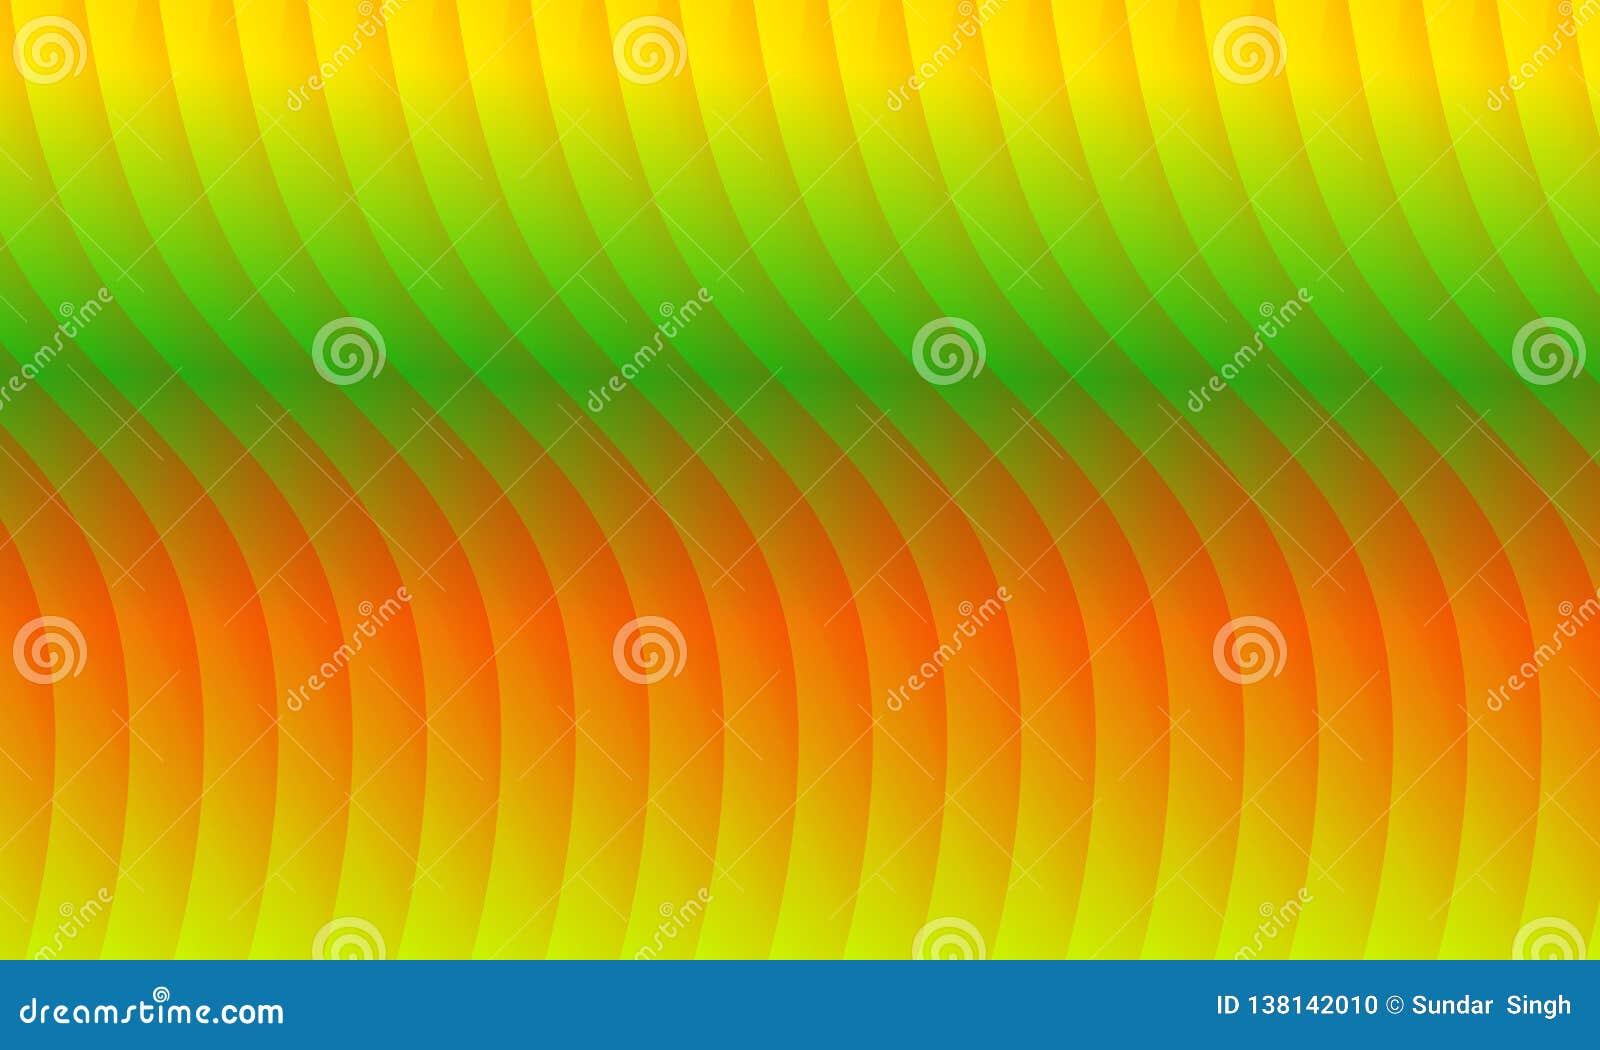 Abstract Redyellowgreenand Orange Wave Background